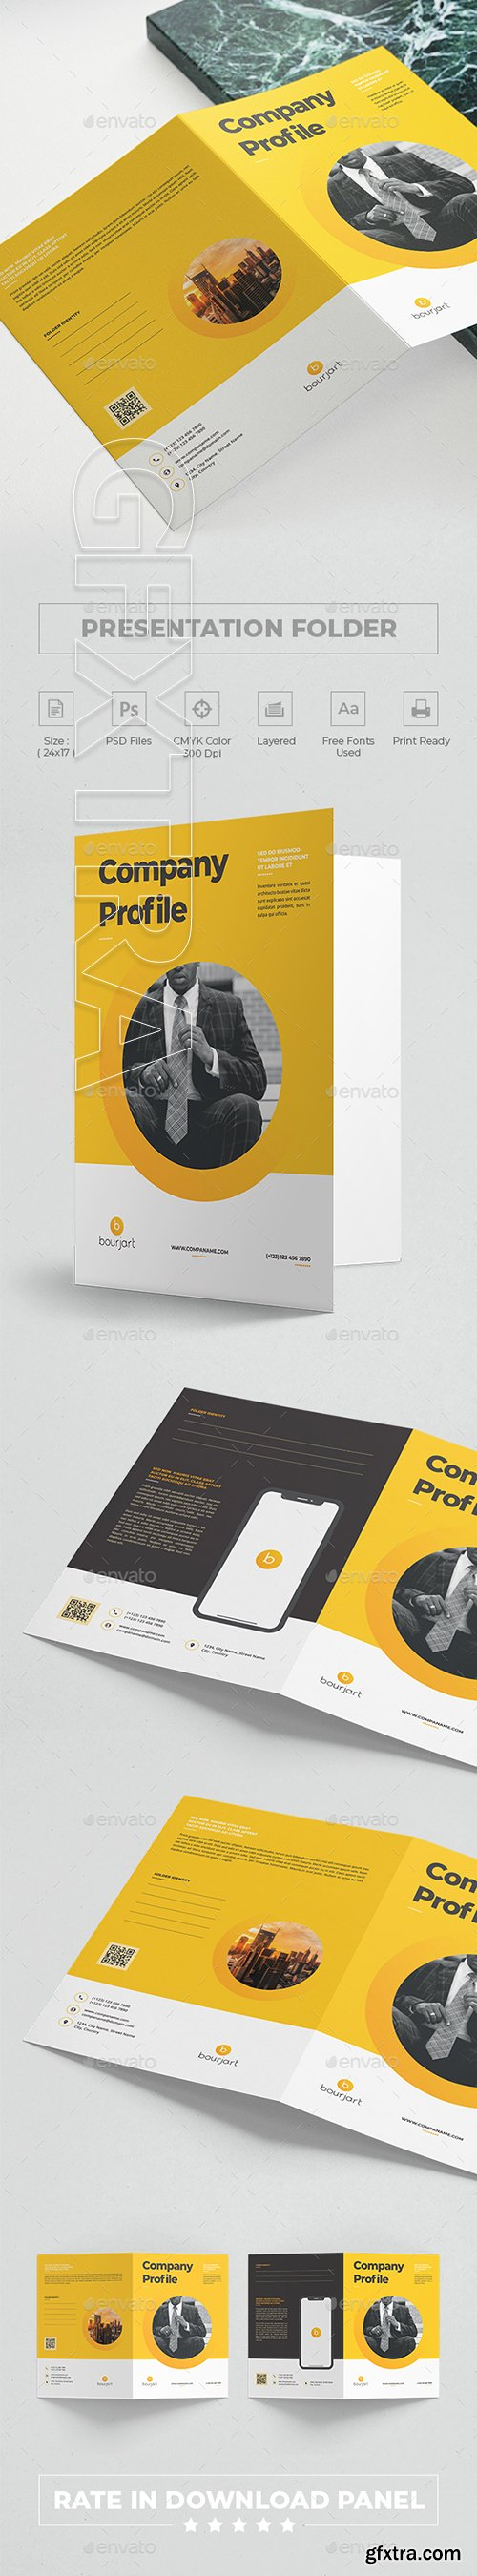 GraphicRiver - Presentation Folder 22873916